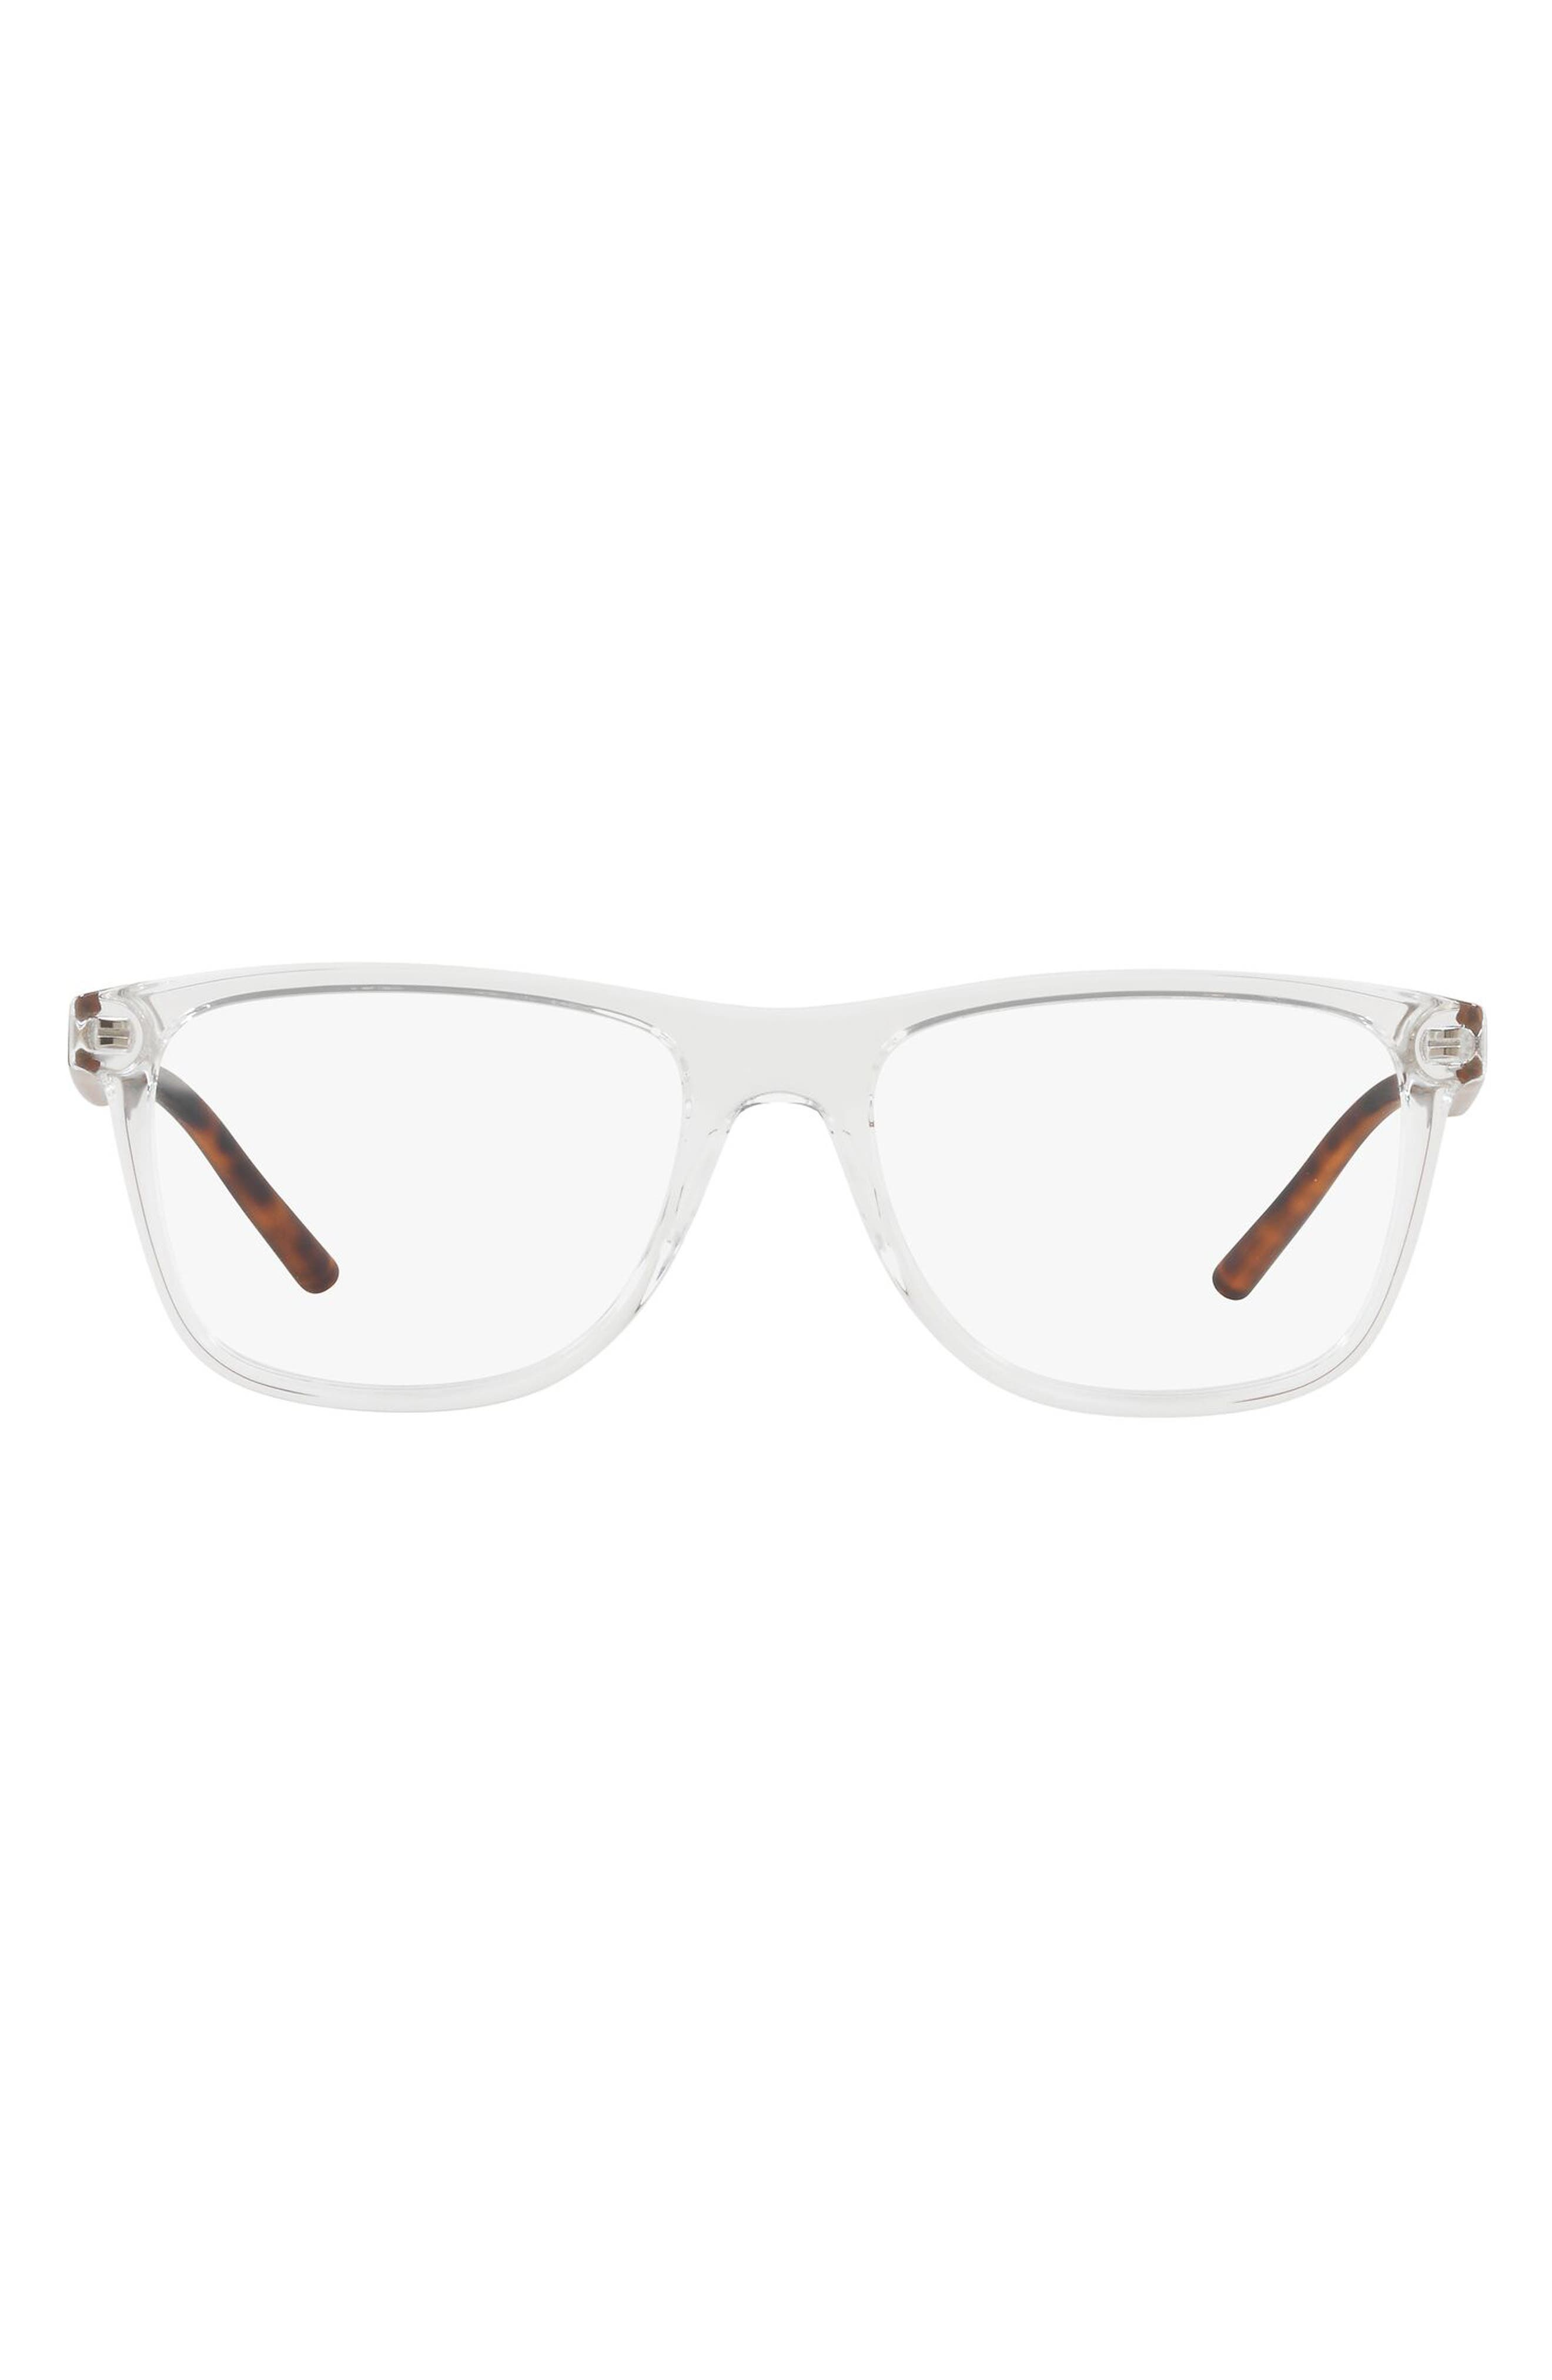 56mm Square Optical Glasses